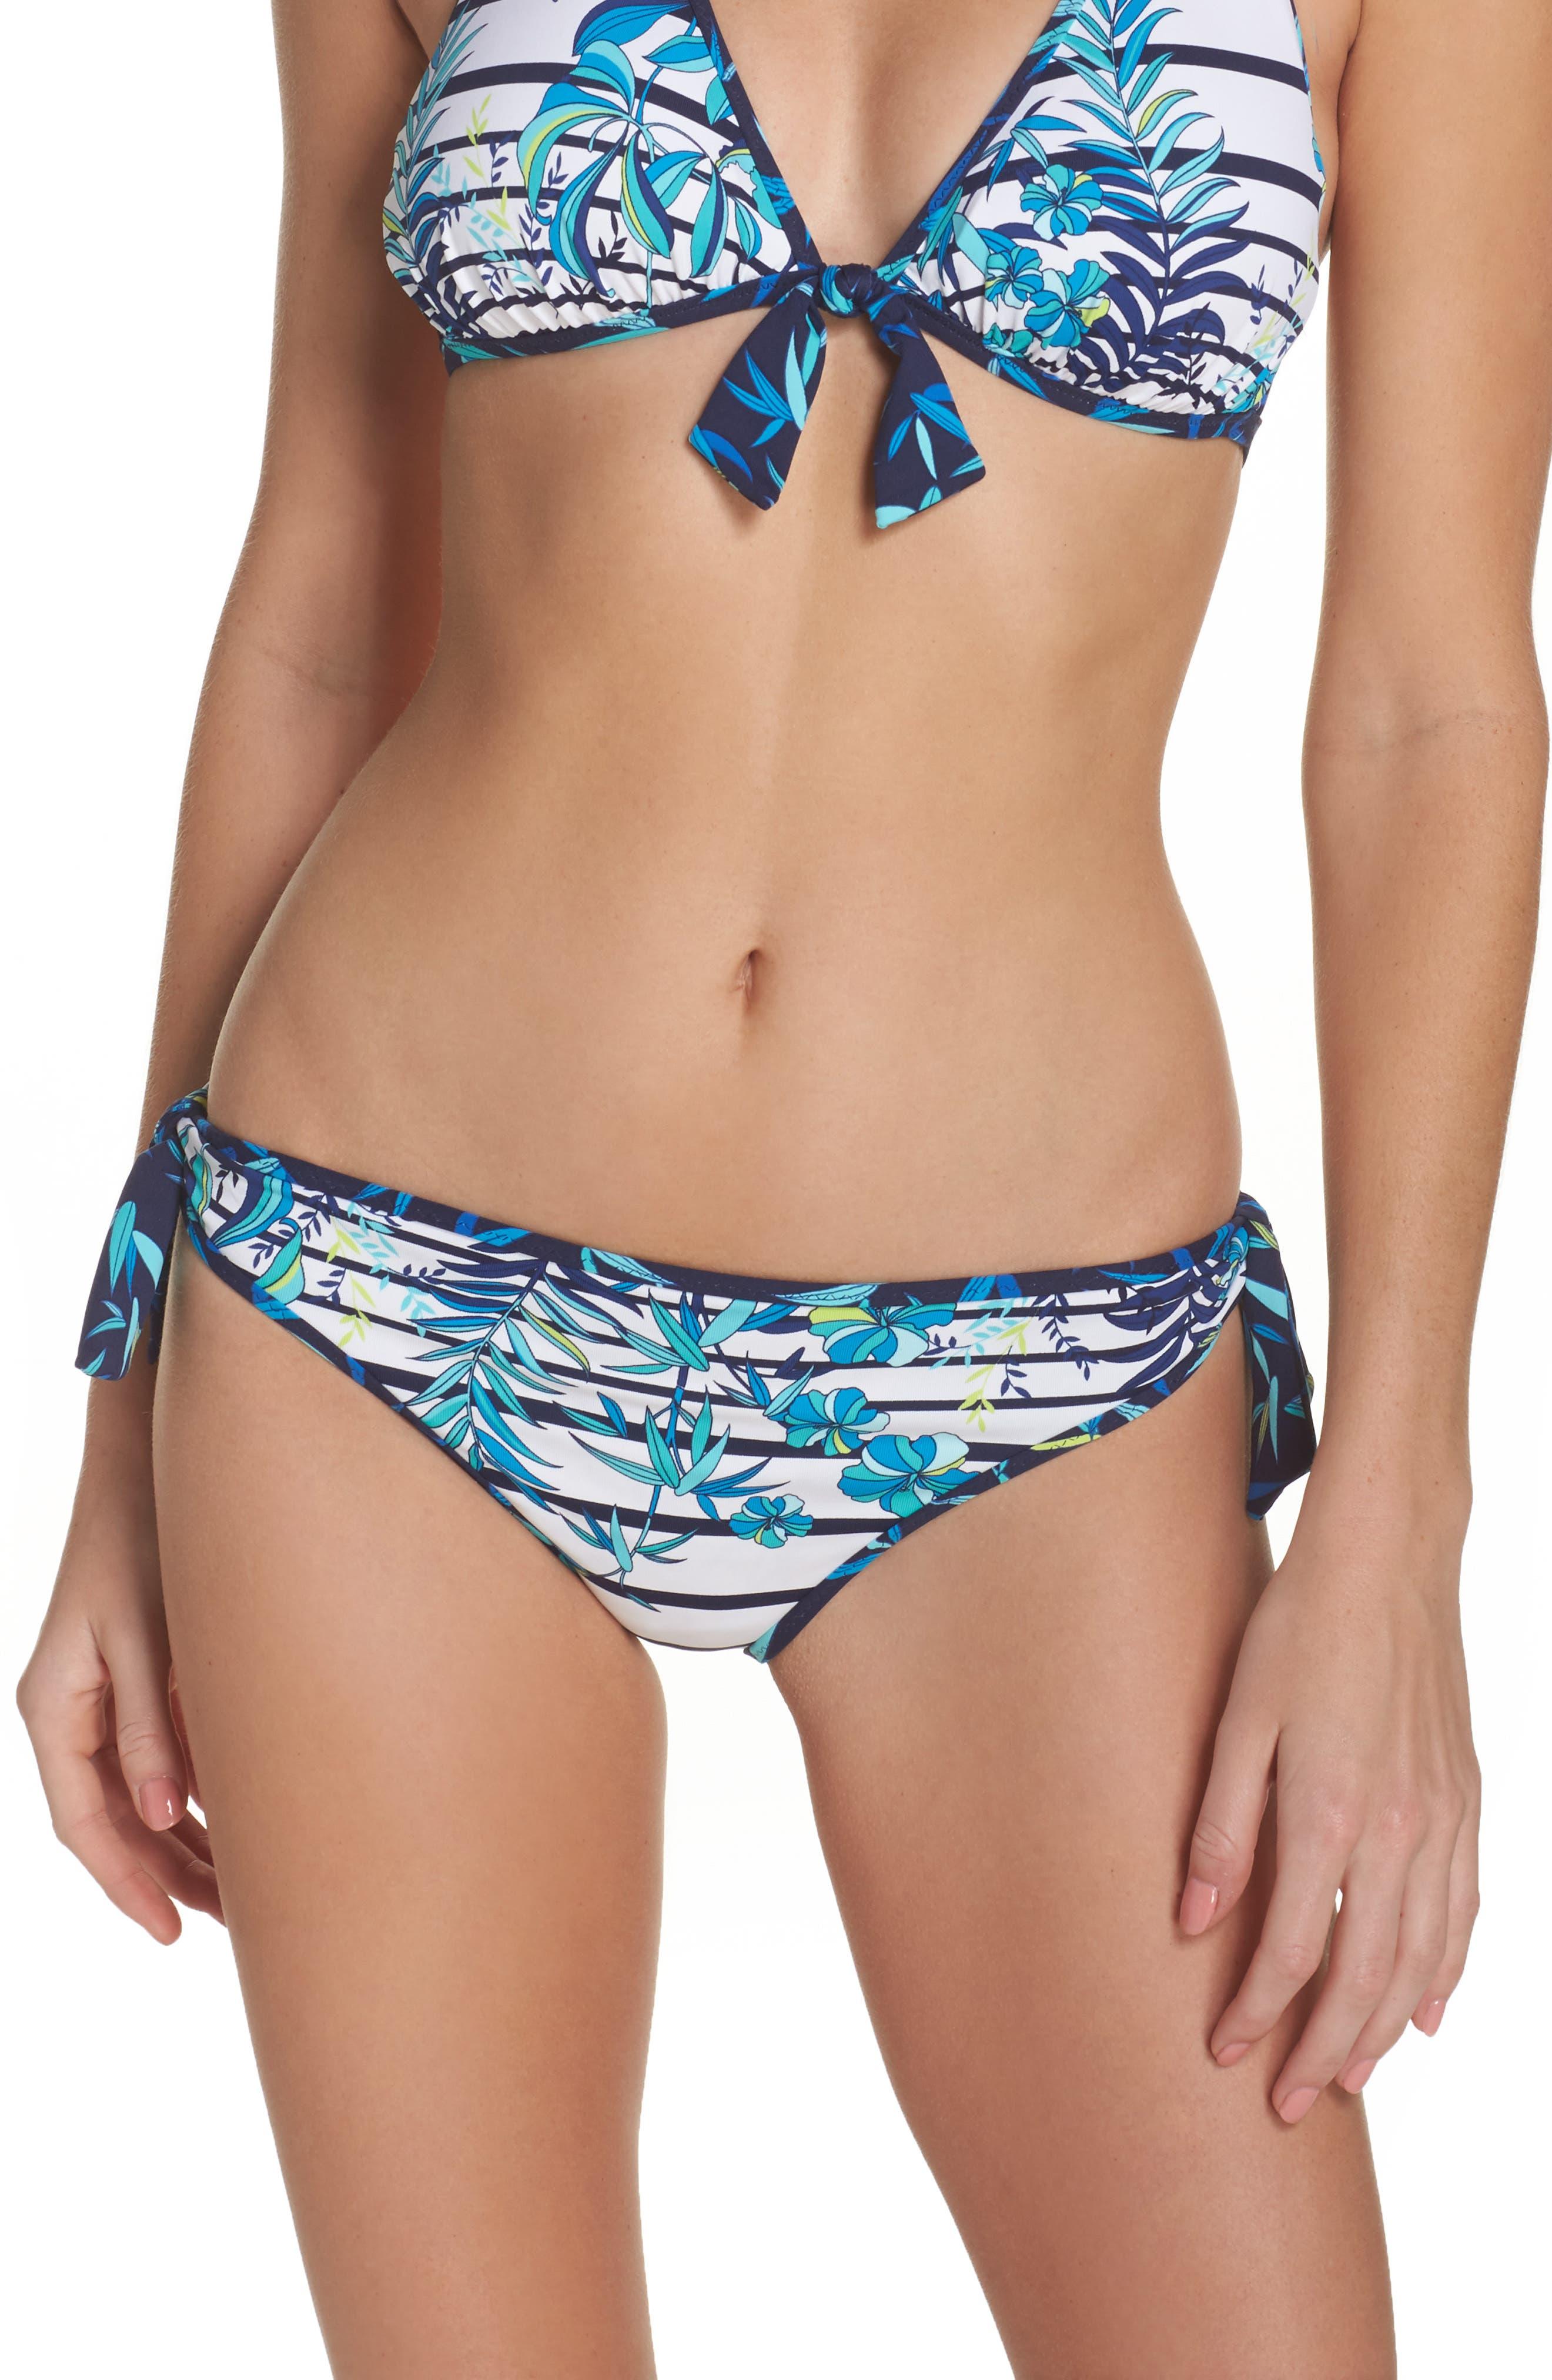 Tropical Swirl Reversible Bikini Bottoms,                             Main thumbnail 1, color,                             Blue/ White